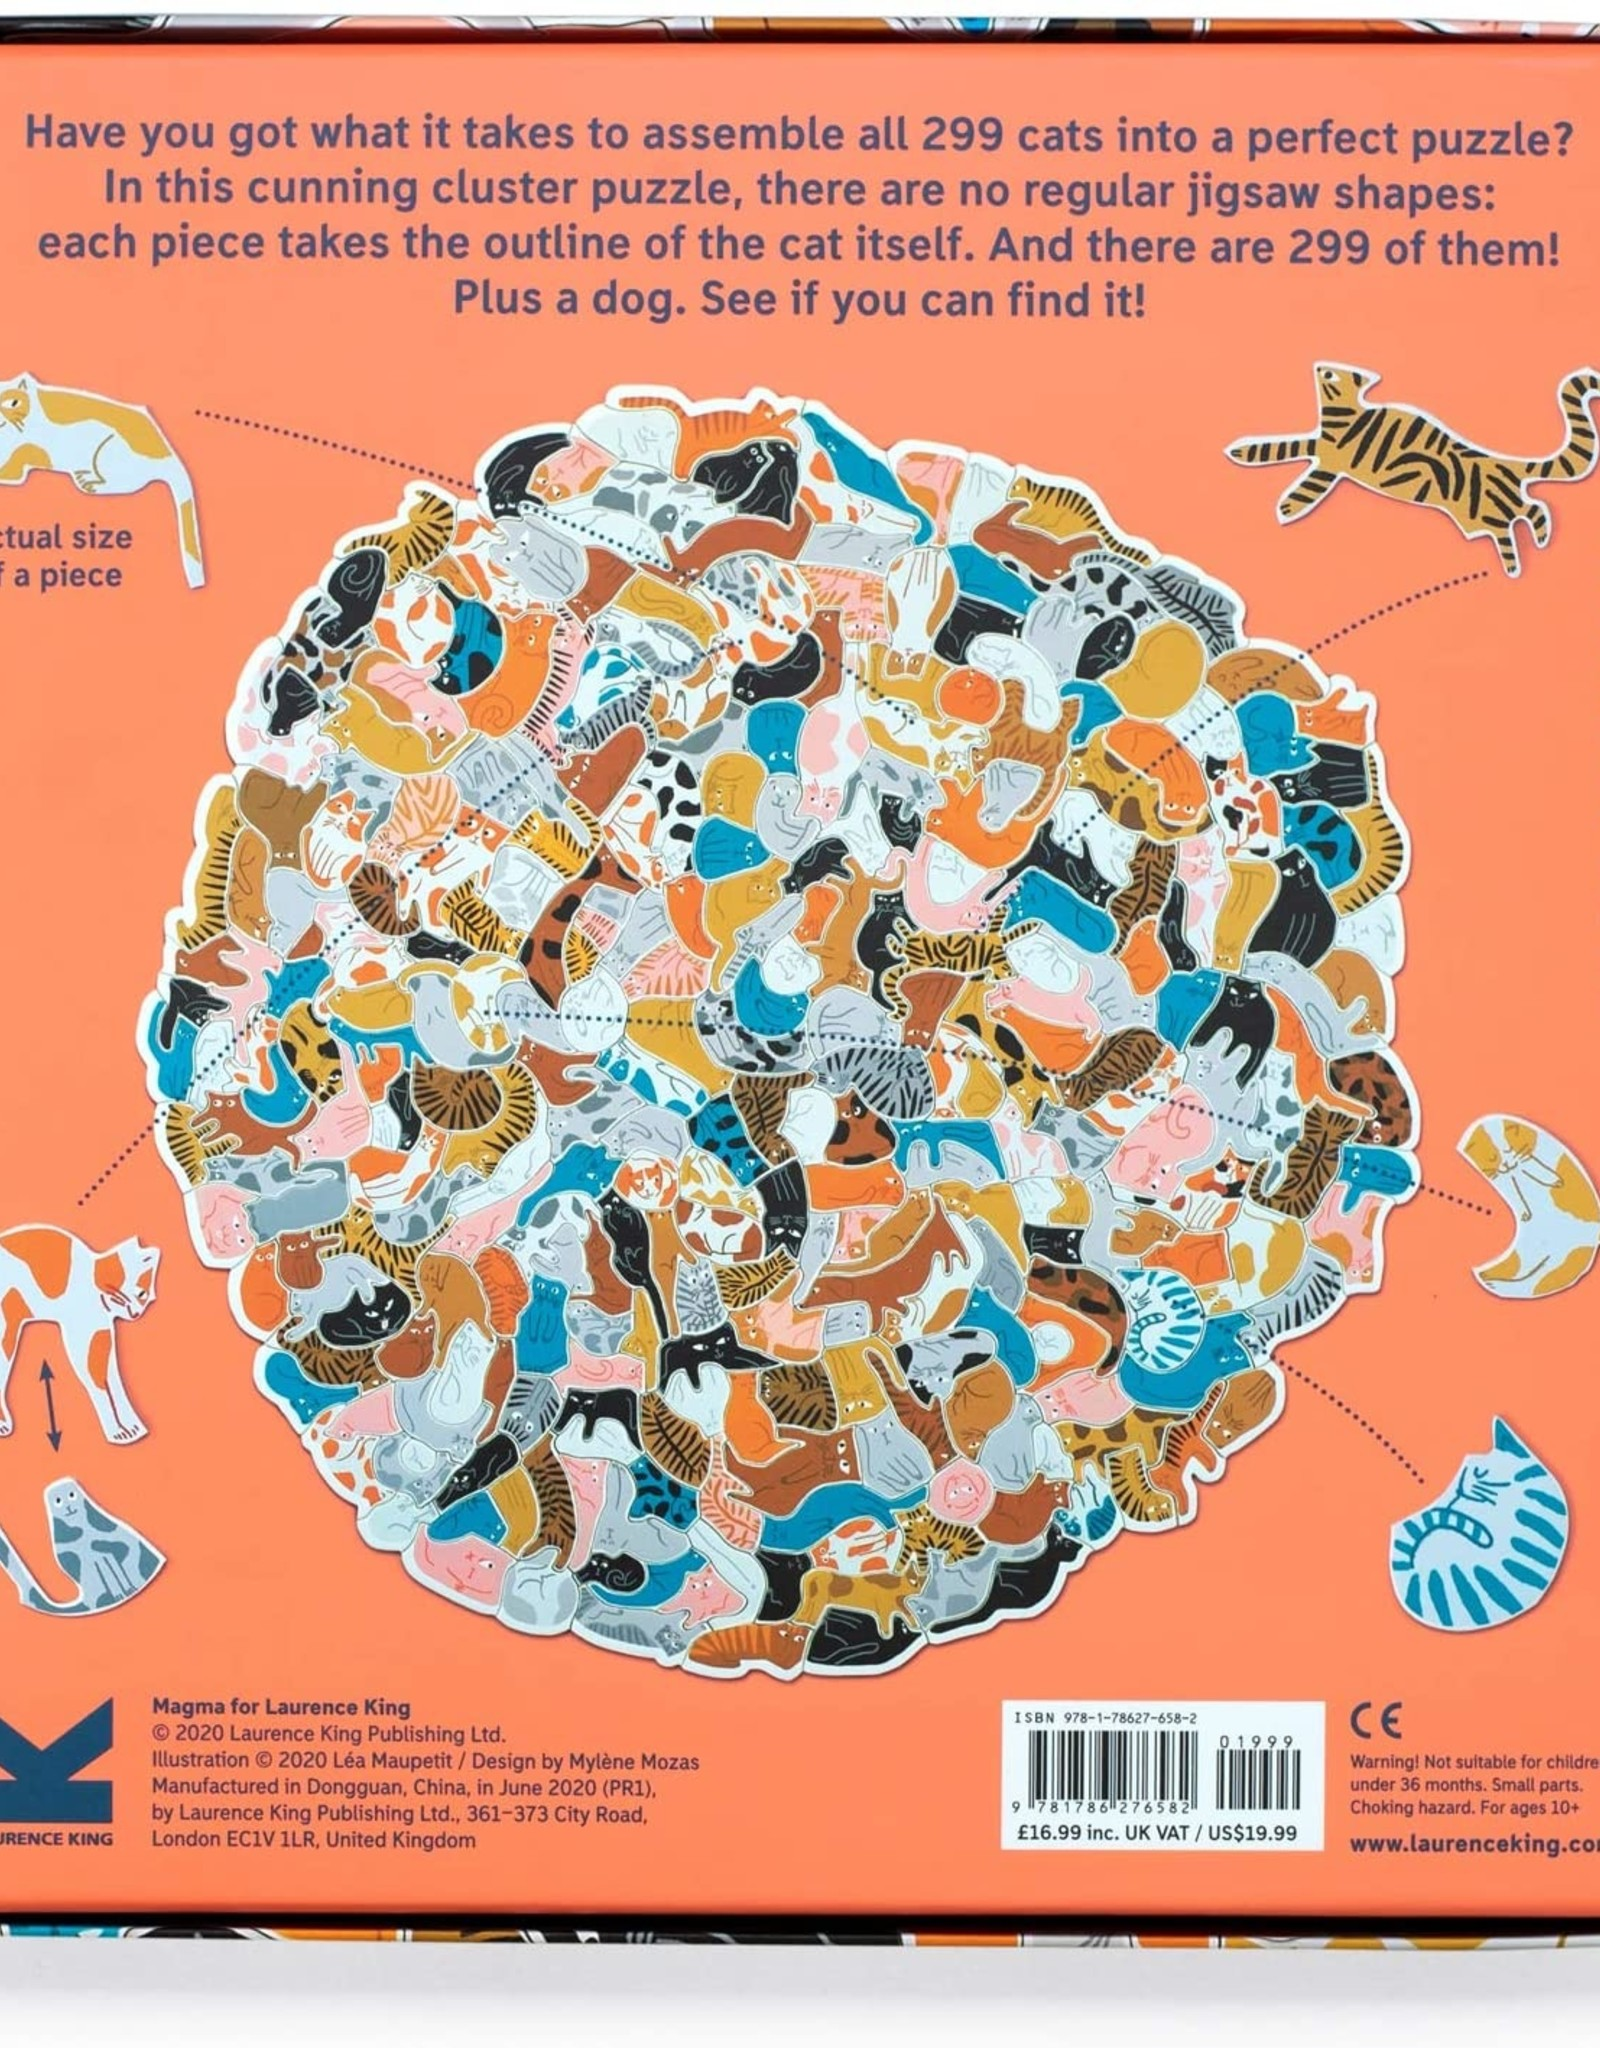 BIS Publishers Léa Maupetit - 299 cats (and a dog) - Feline cluster puzzle